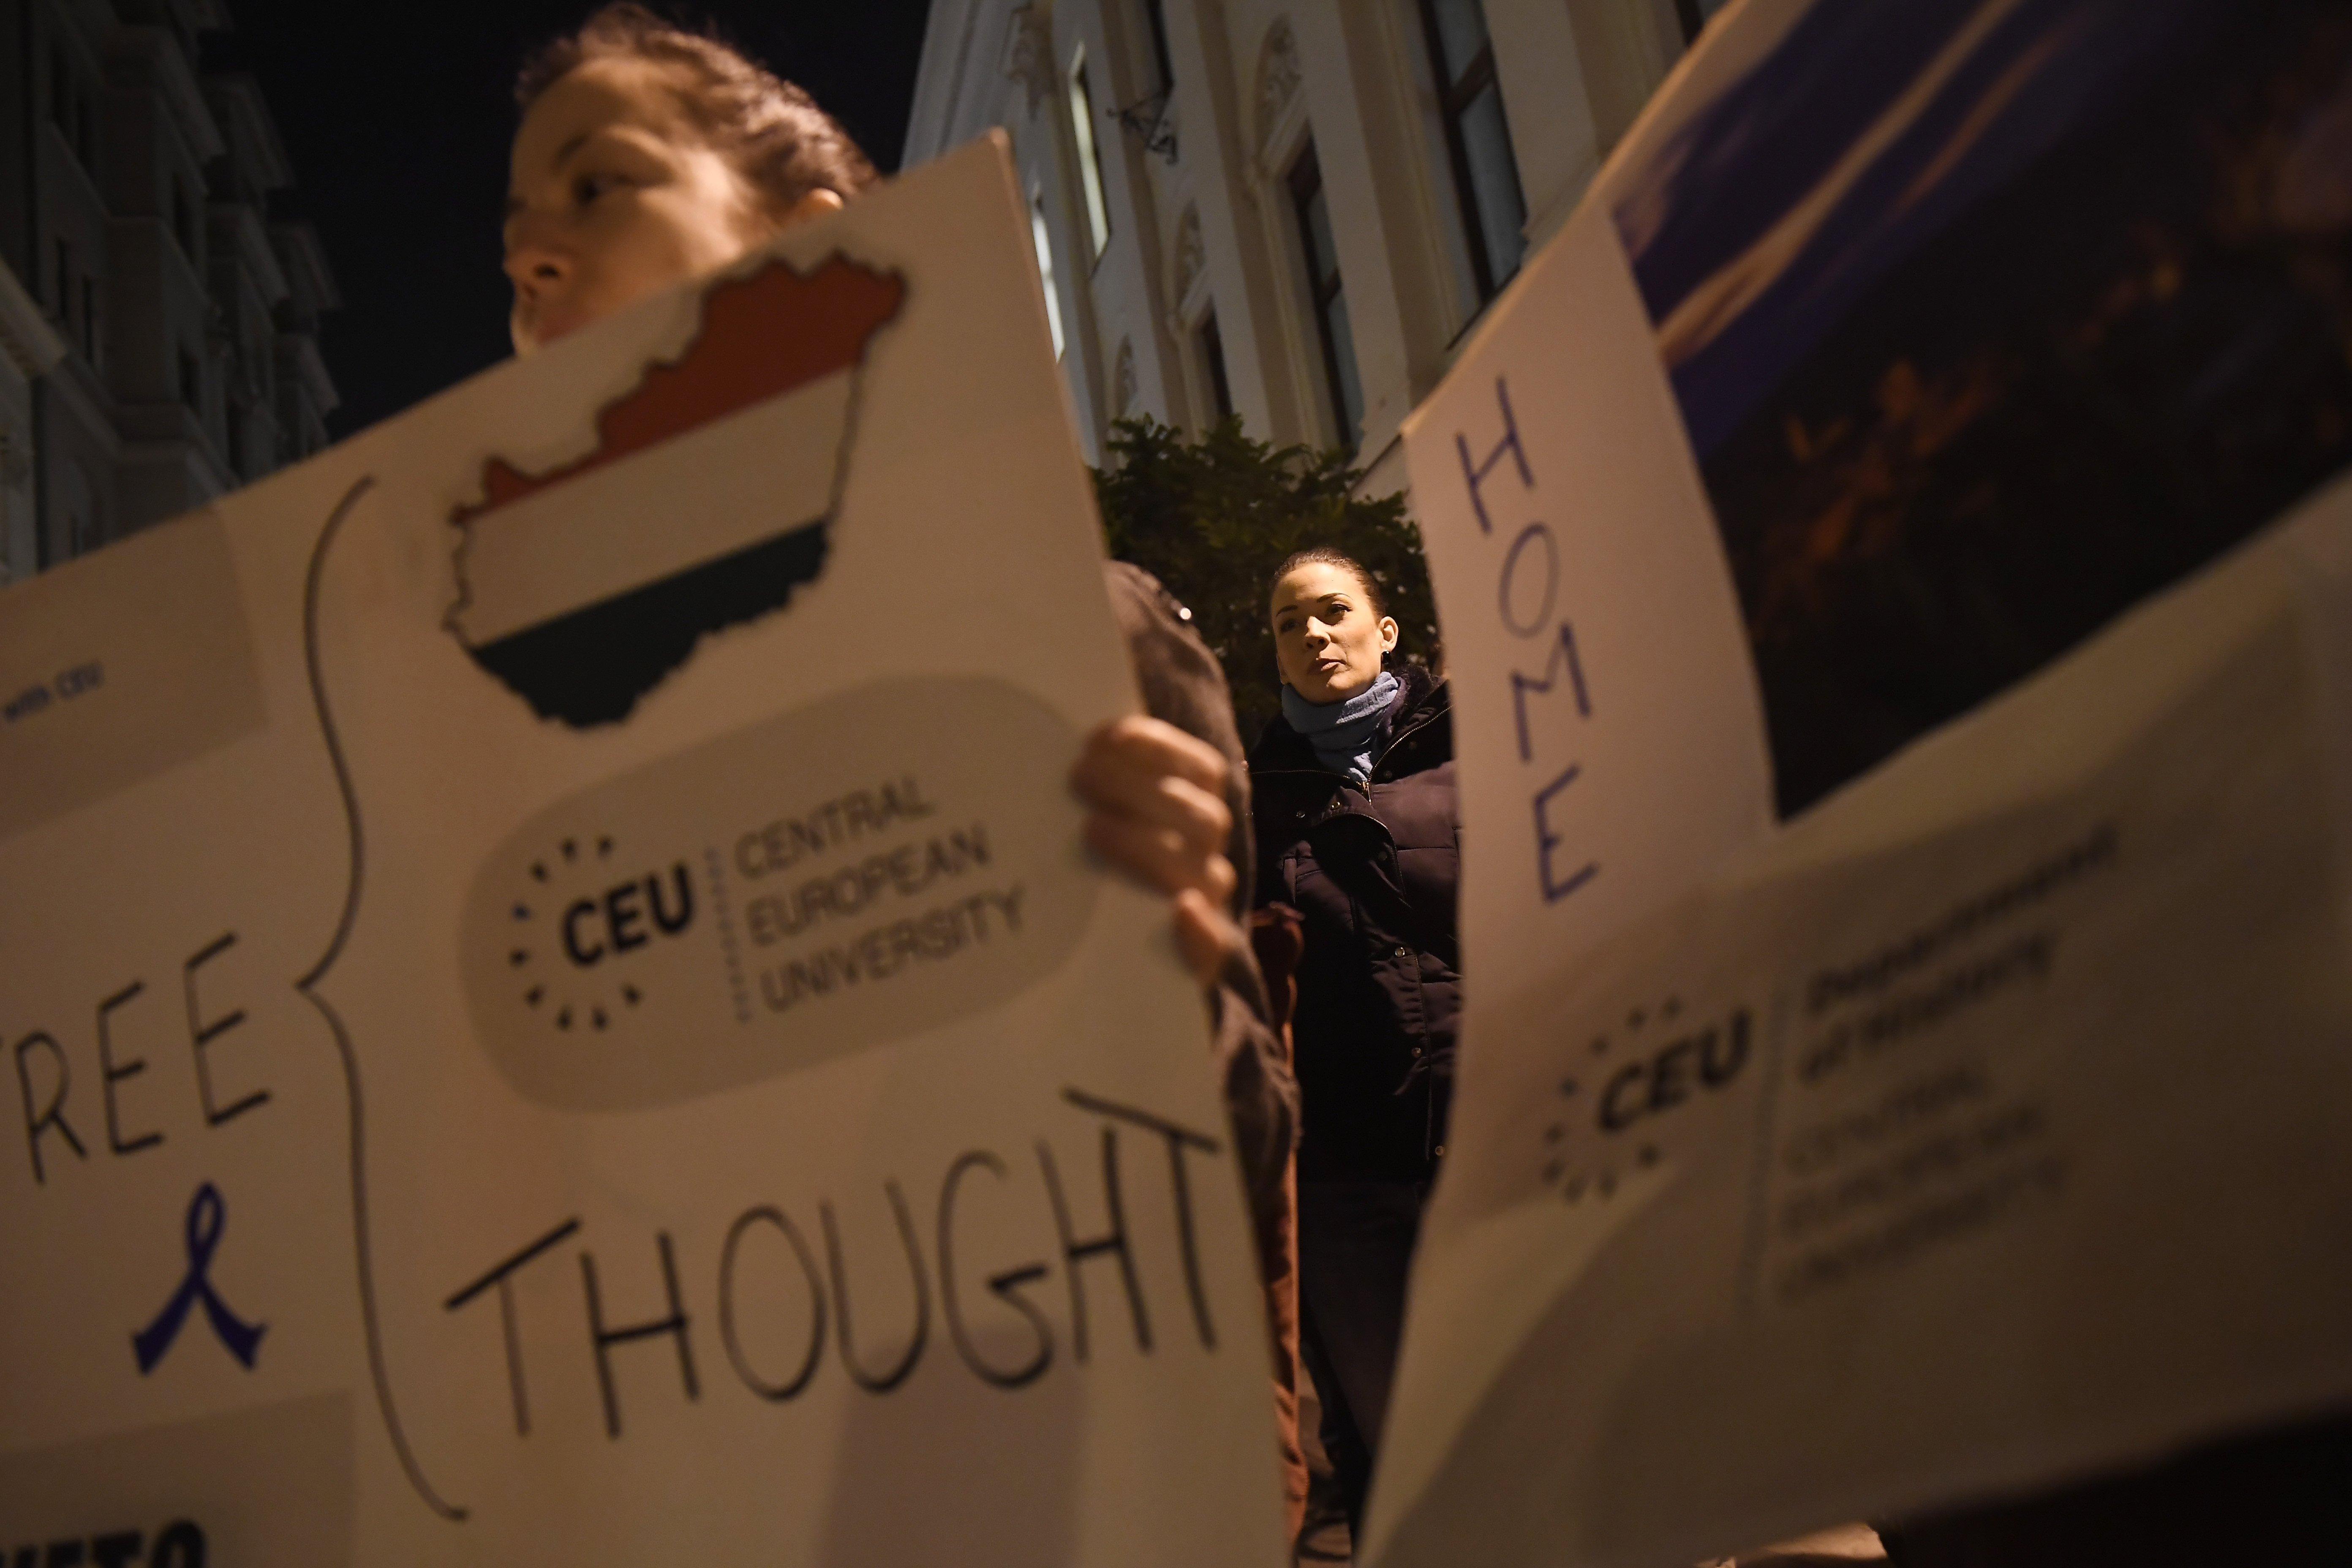 Presseschau: CEU verlegt Studiengänge nach Wien post's picture